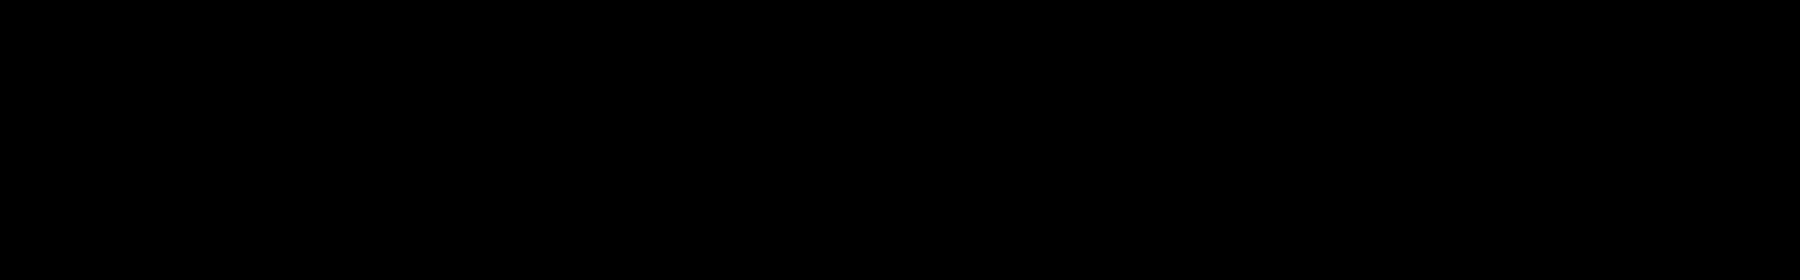 Drill audio waveform